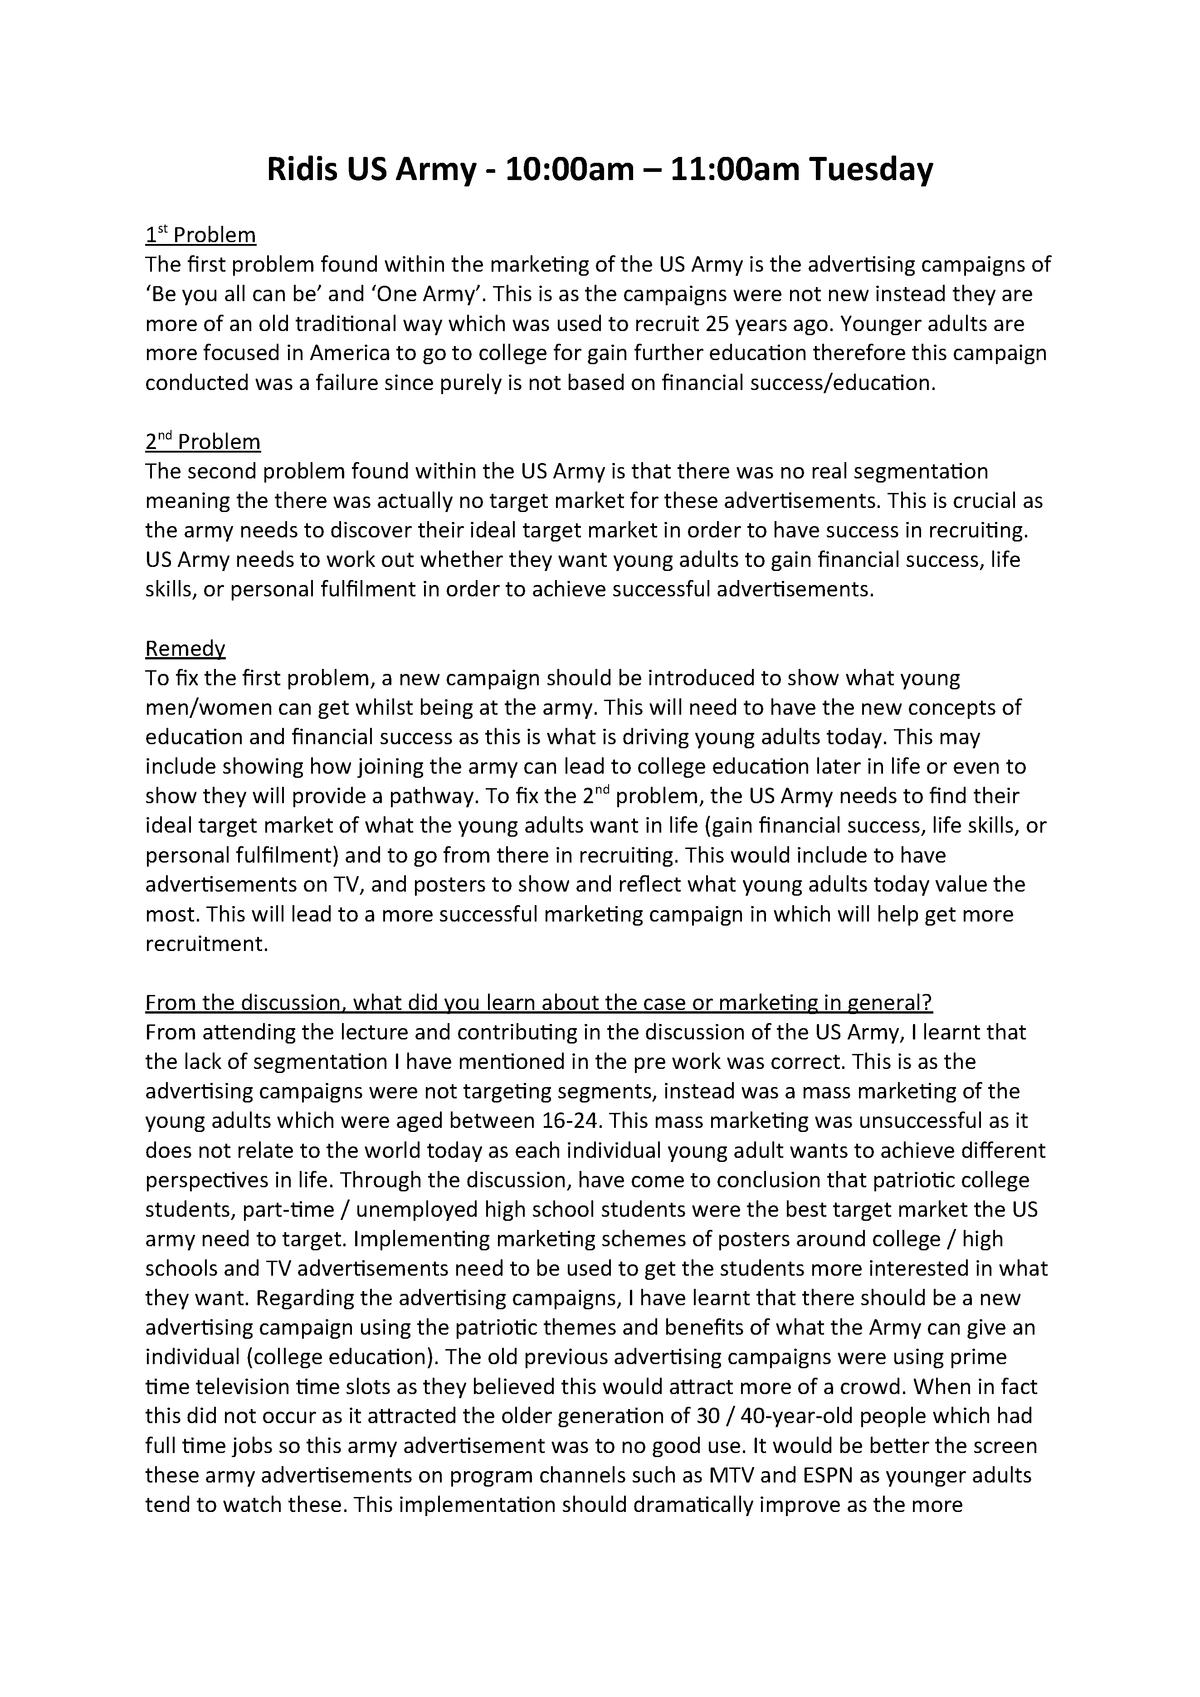 Best study abroad essays